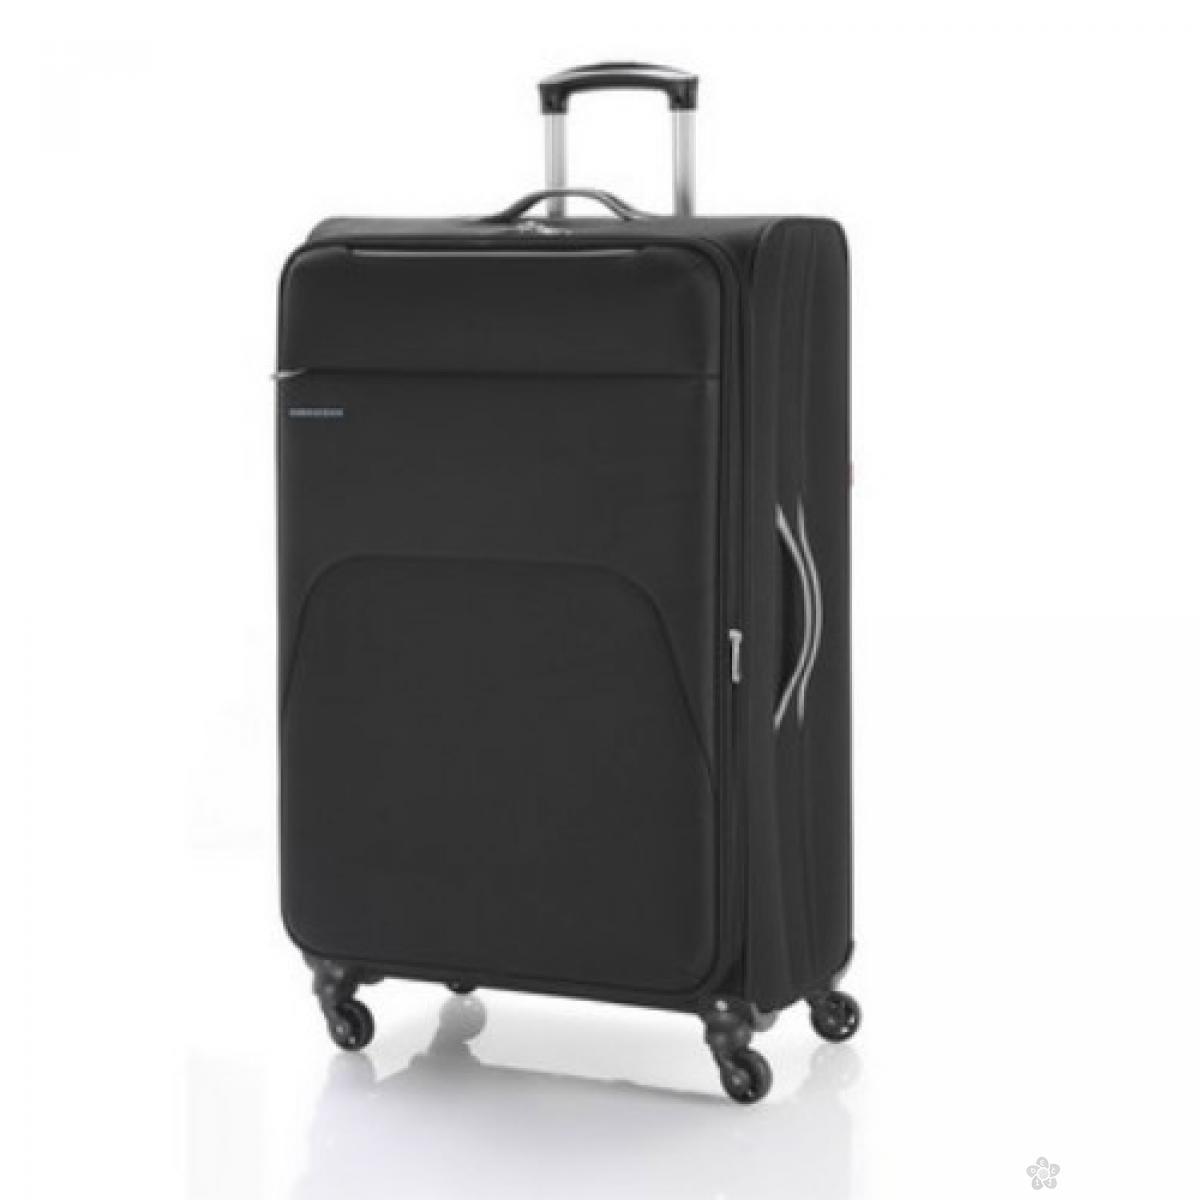 Kofer veliki  polyester Zambia crna, 16KG113447B